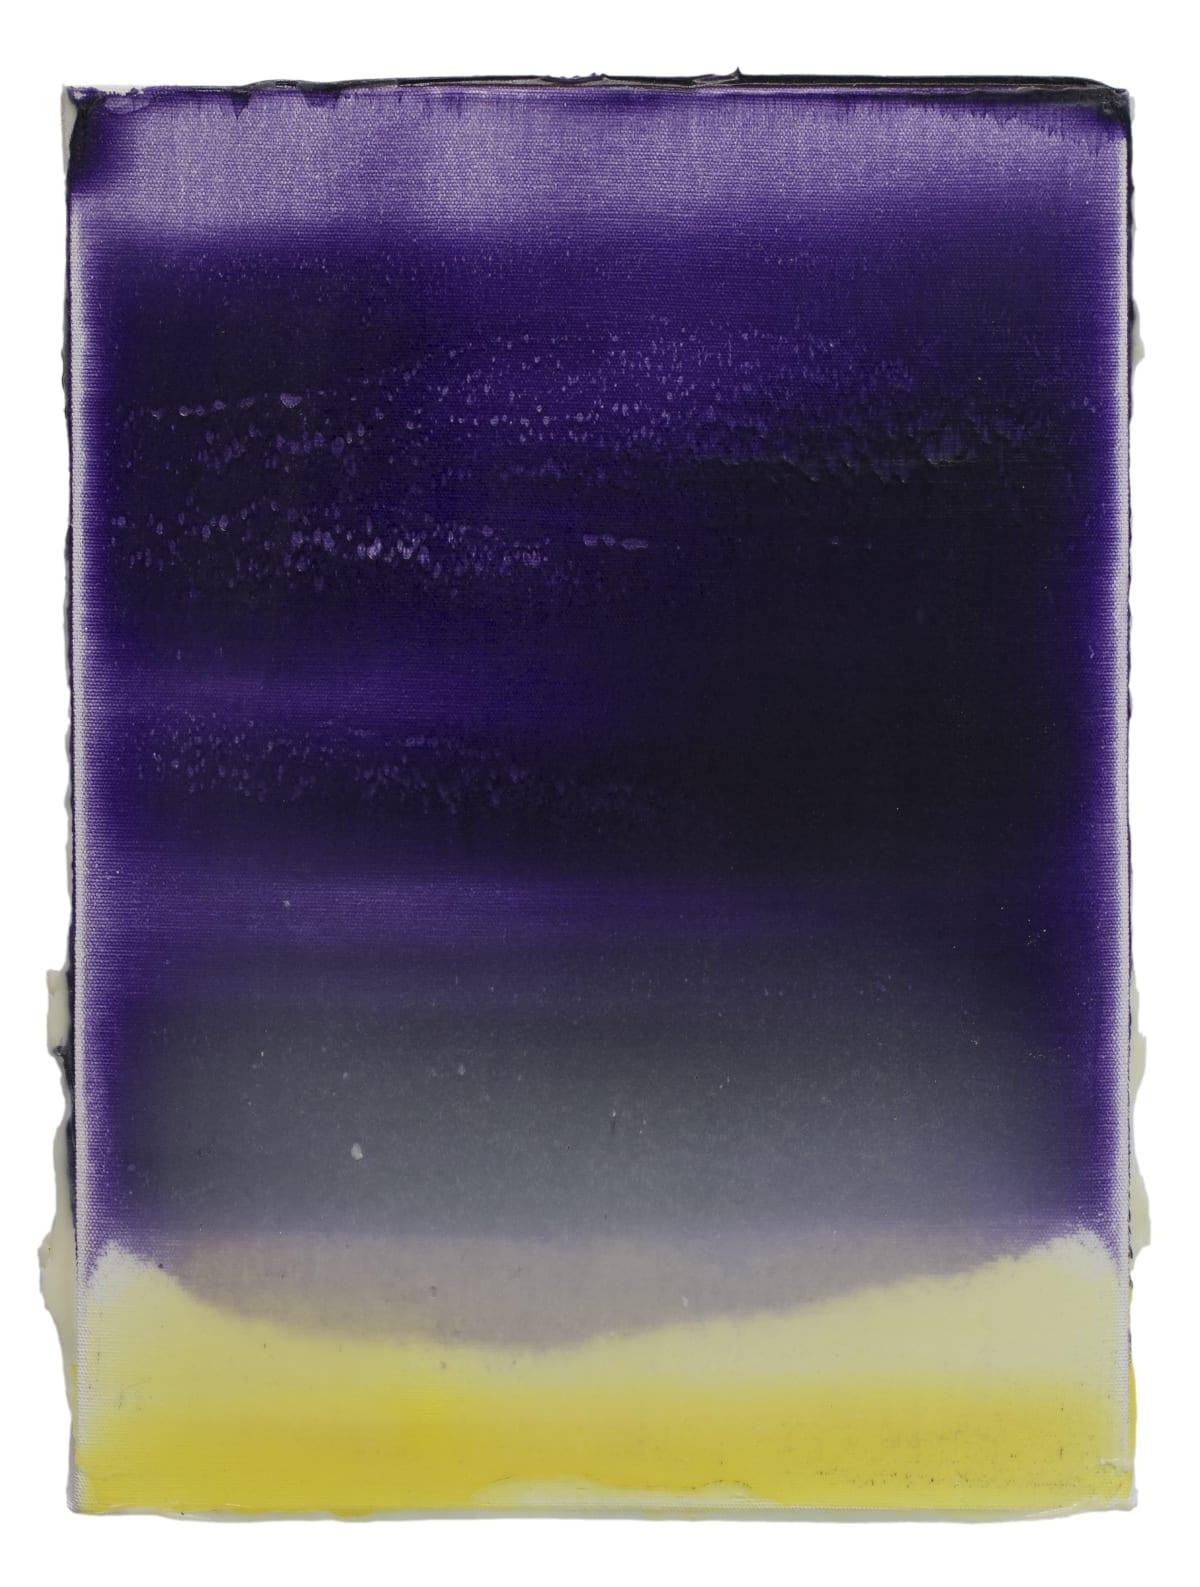 Hepetica Americana, 2019, acrylic on canvas, 36 x 27 cm